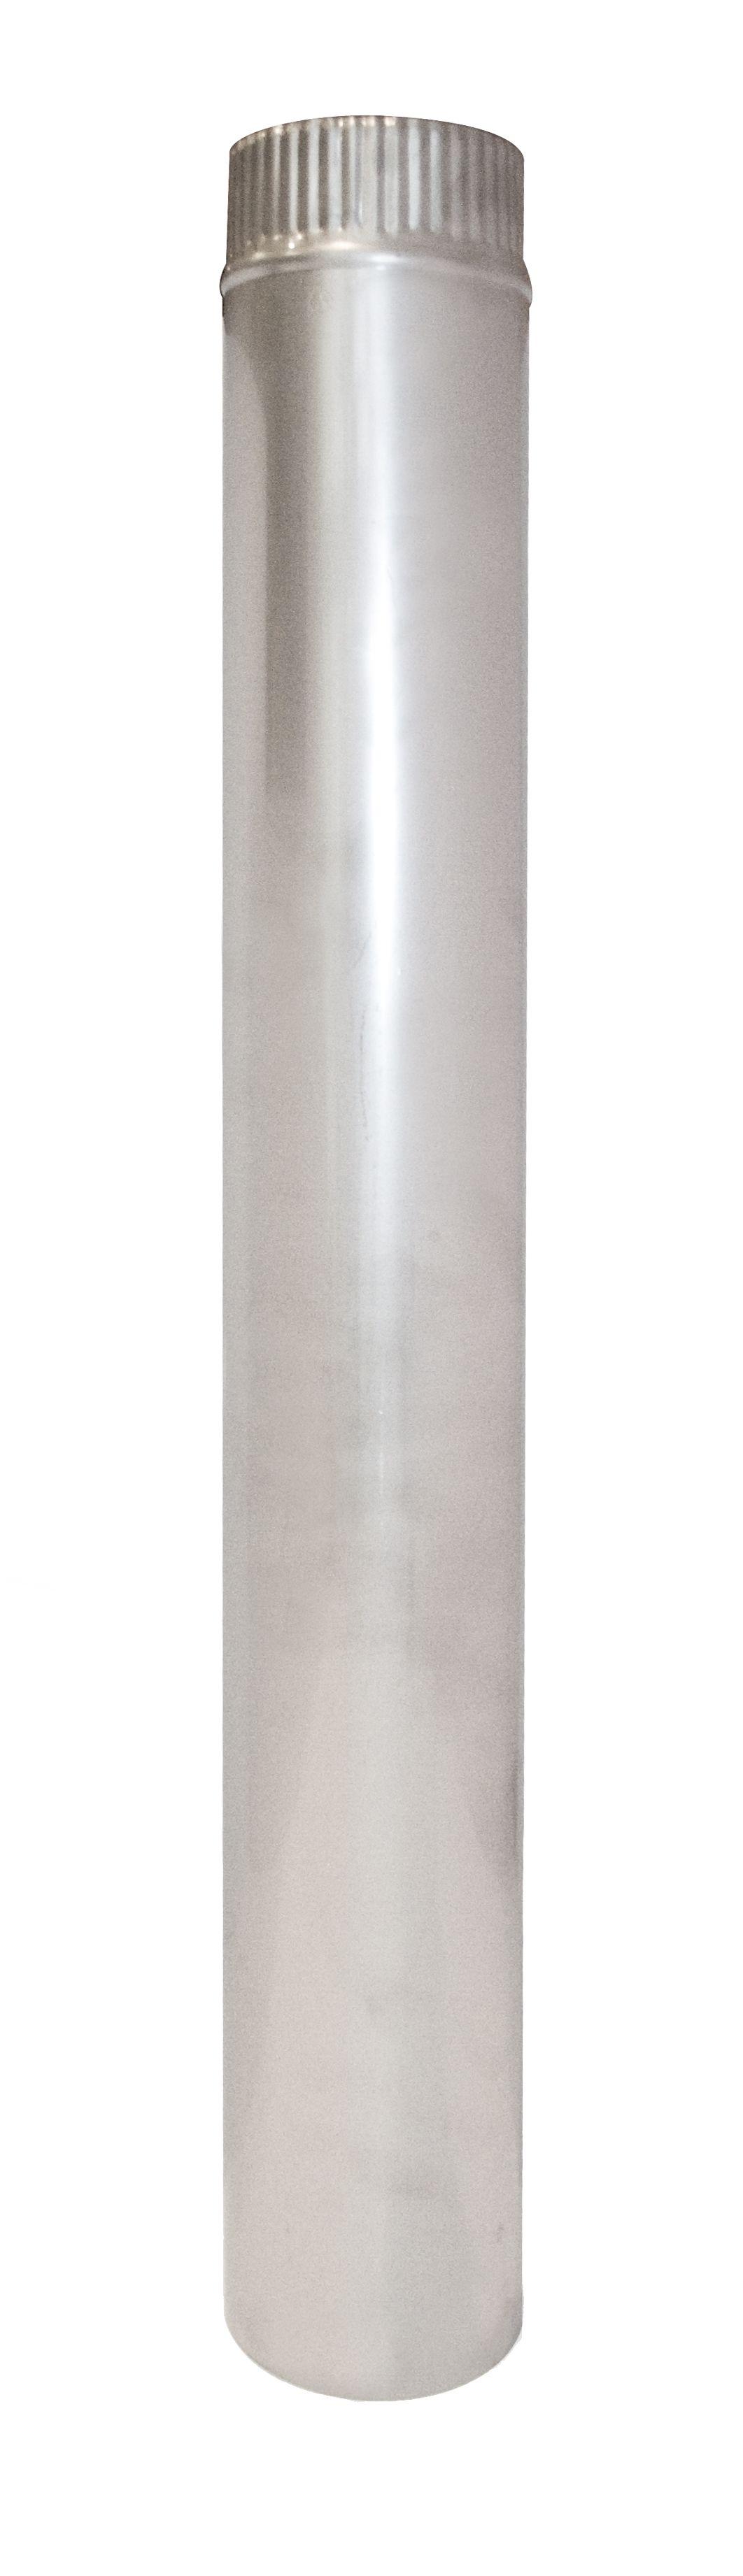 Tubo mi media de tubo